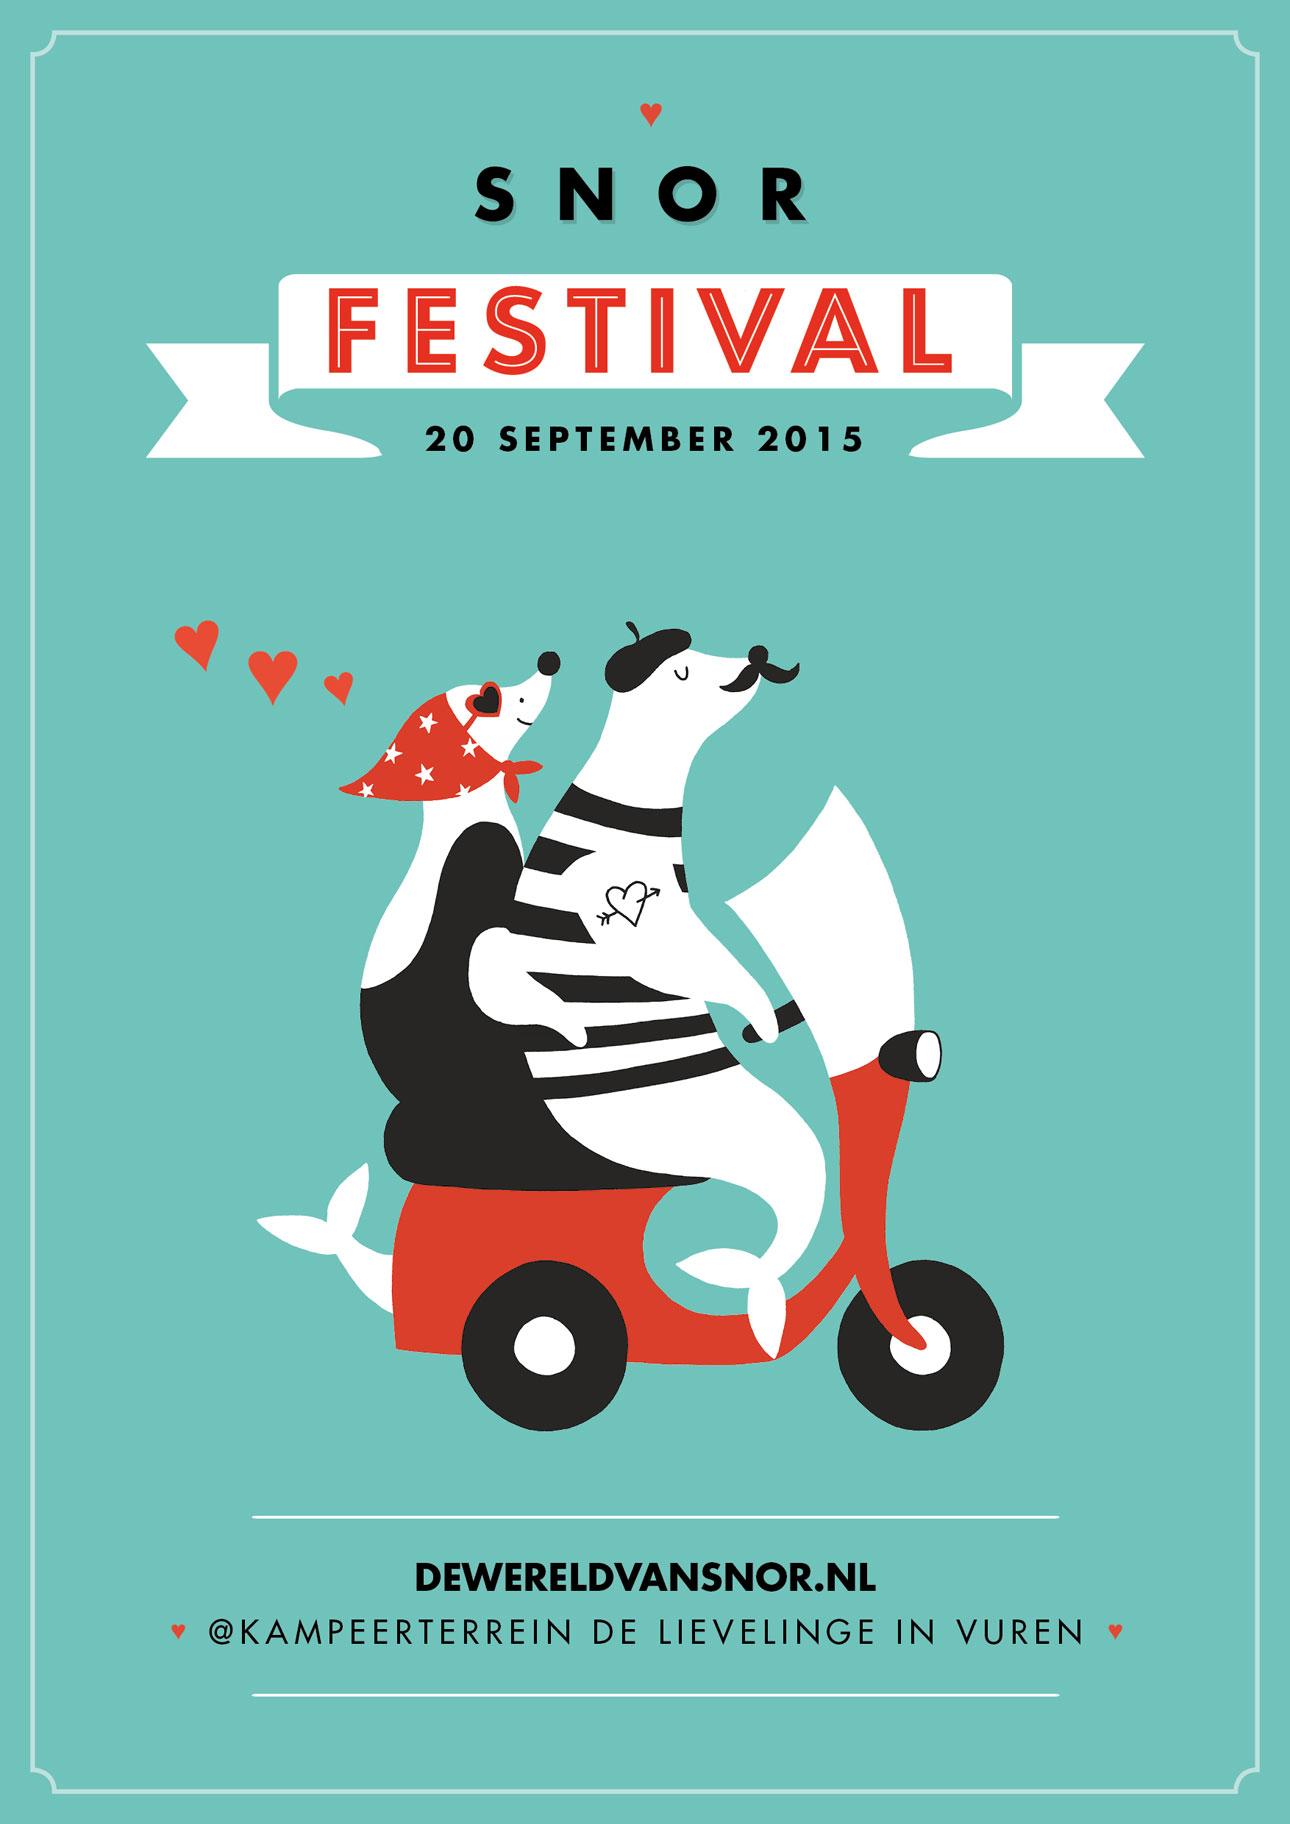 snor festival uitgeverij snor 20 september